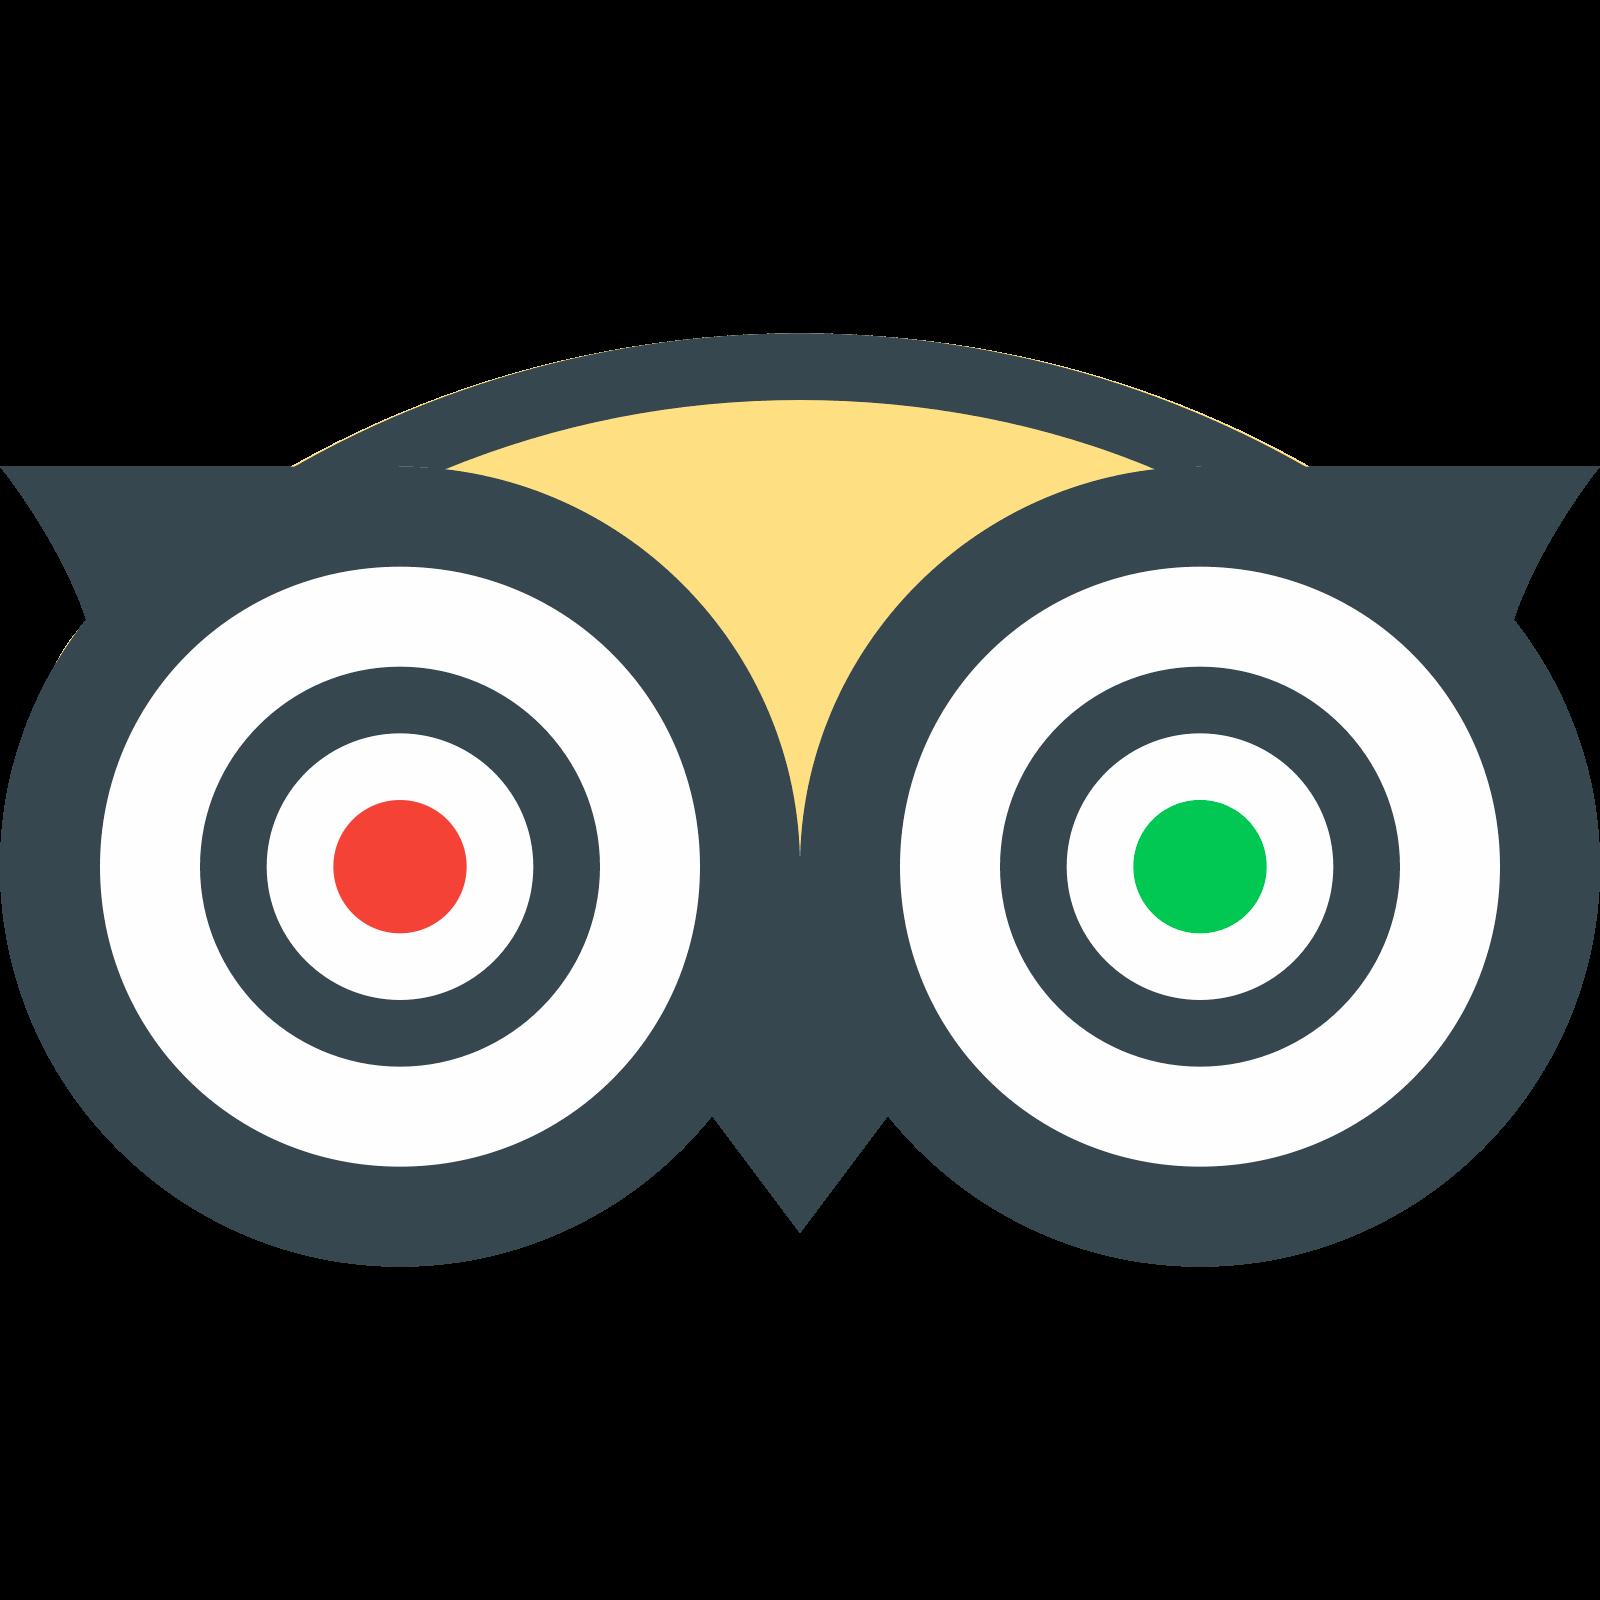 TripAdvisor icon. PNG 50 px - Tripadvisor PNG